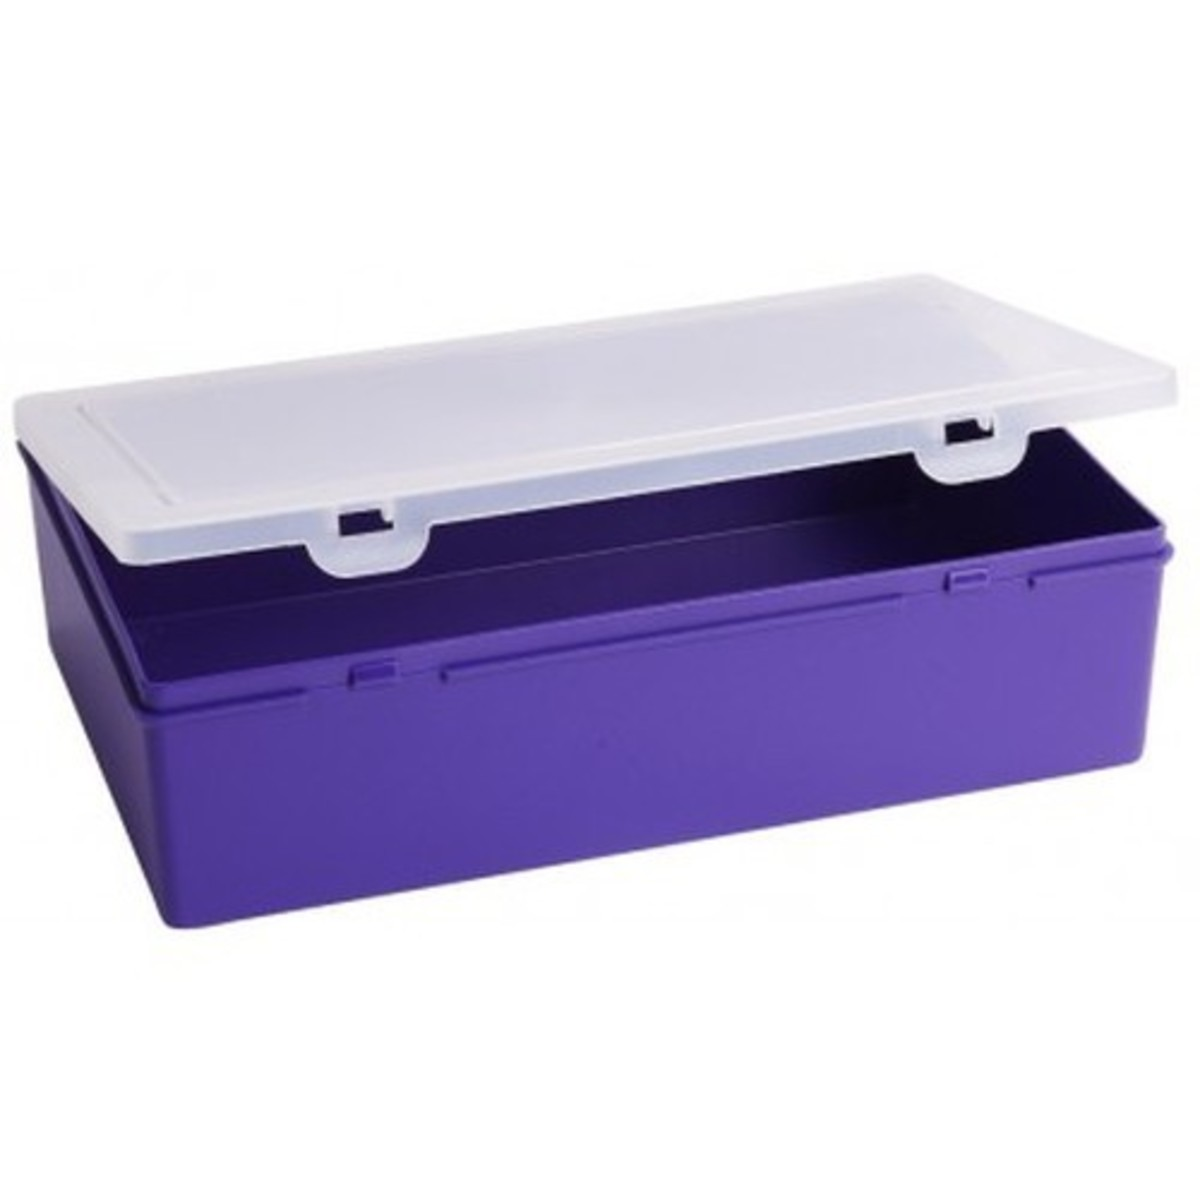 Органайзер Для Мелочей 29Х19Х8 Фиолетовый